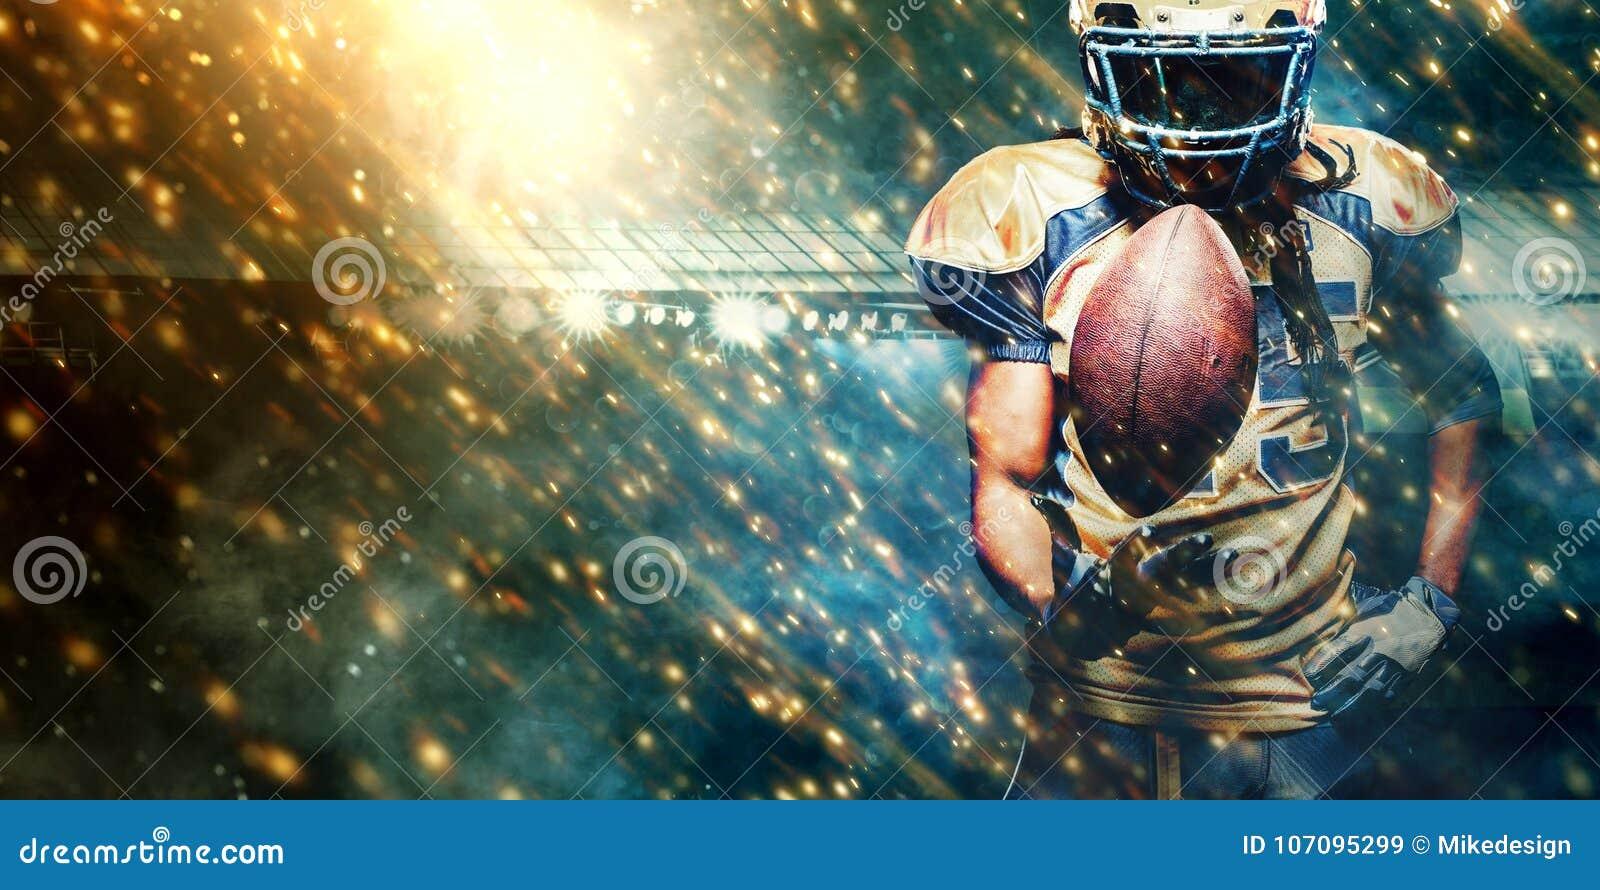 American Football Sportsman Player On Stadium Running In